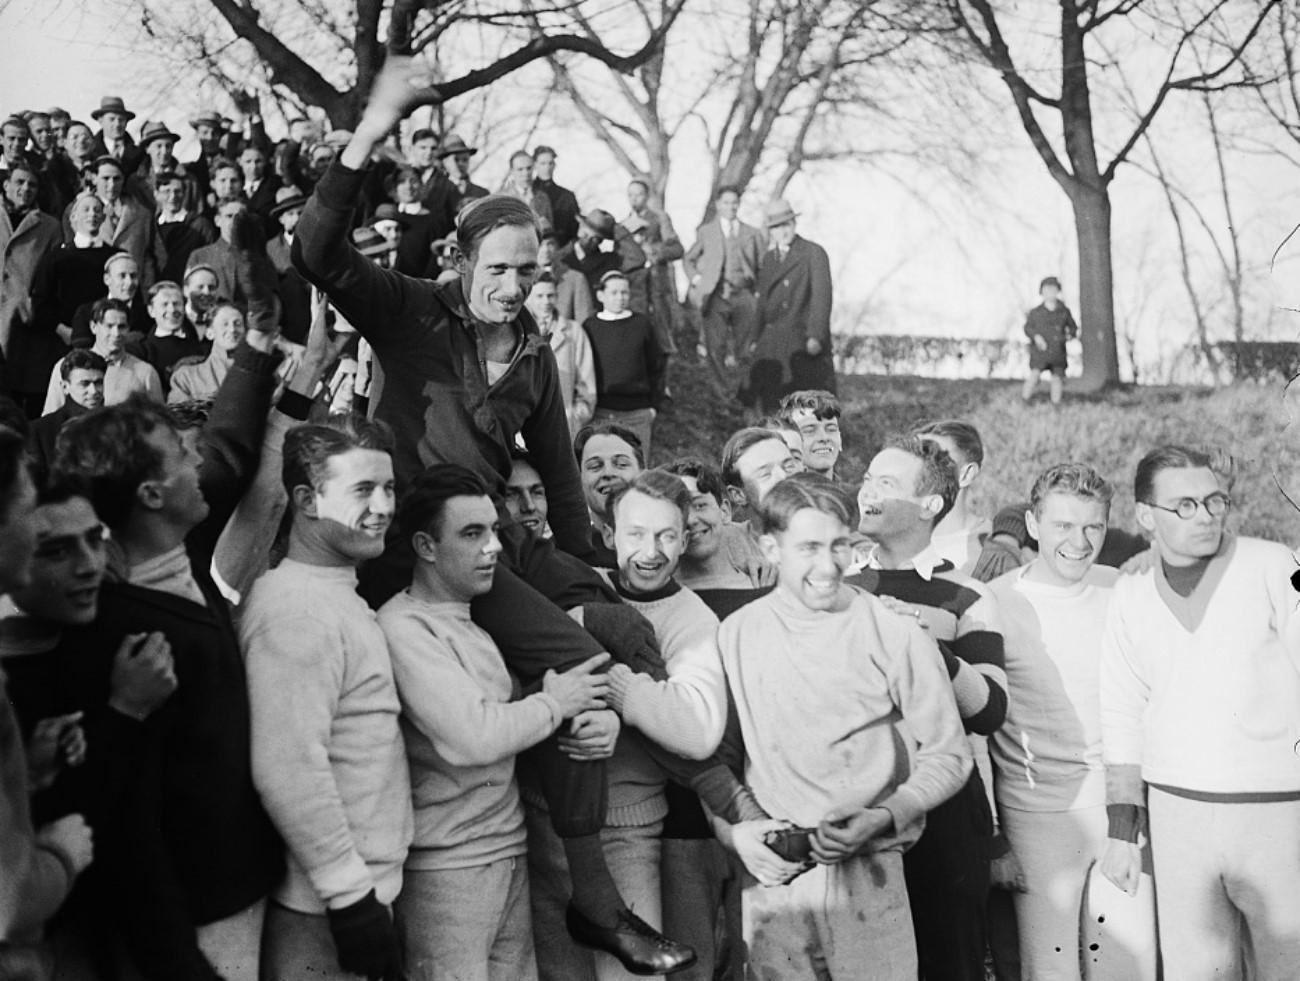 Гомосексуалисты 1941 год